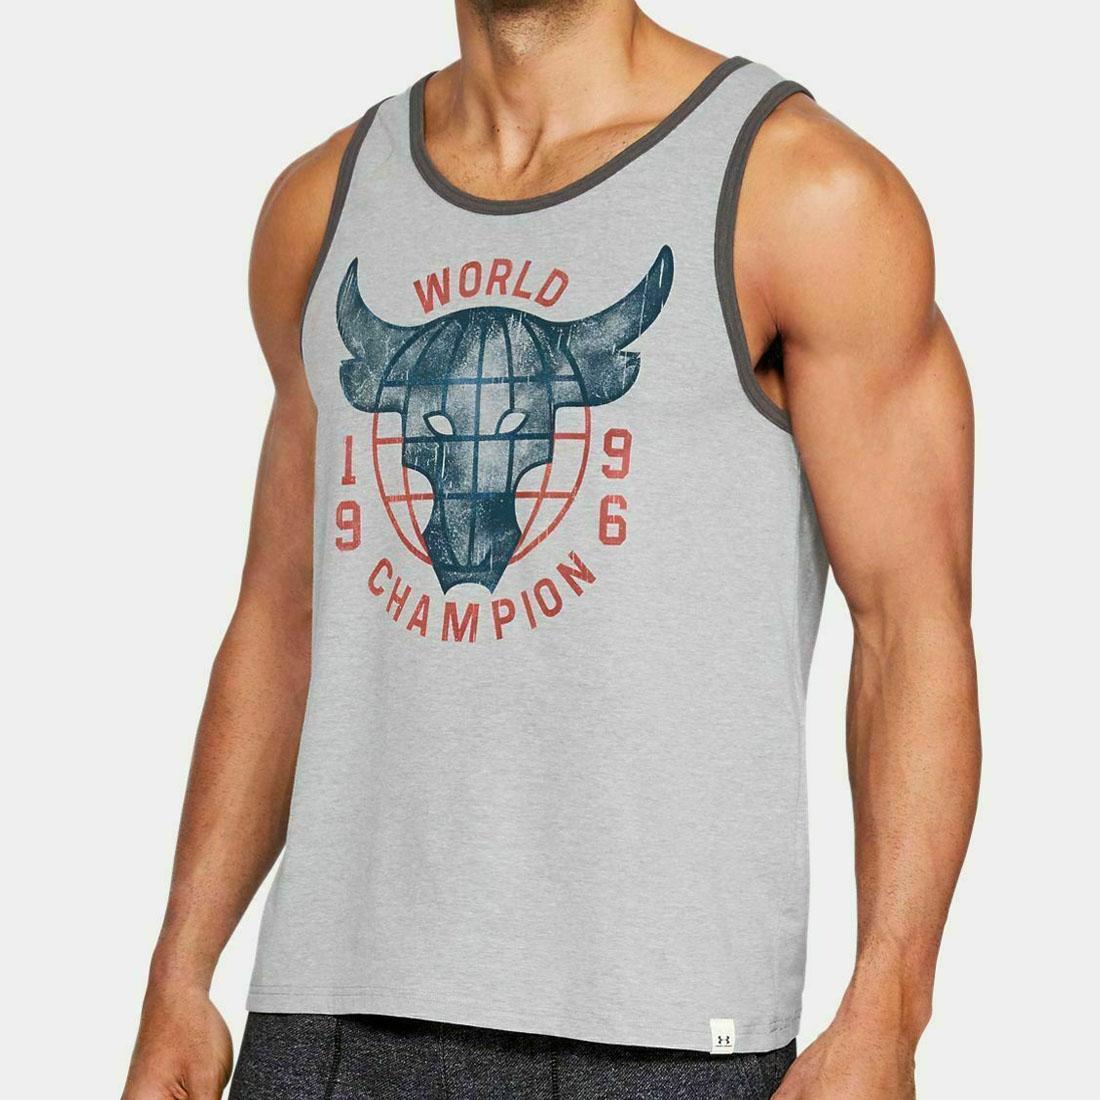 Under Armour UA x Project Rock World Champion Tank Top Men/'s Sz S 1326390-001